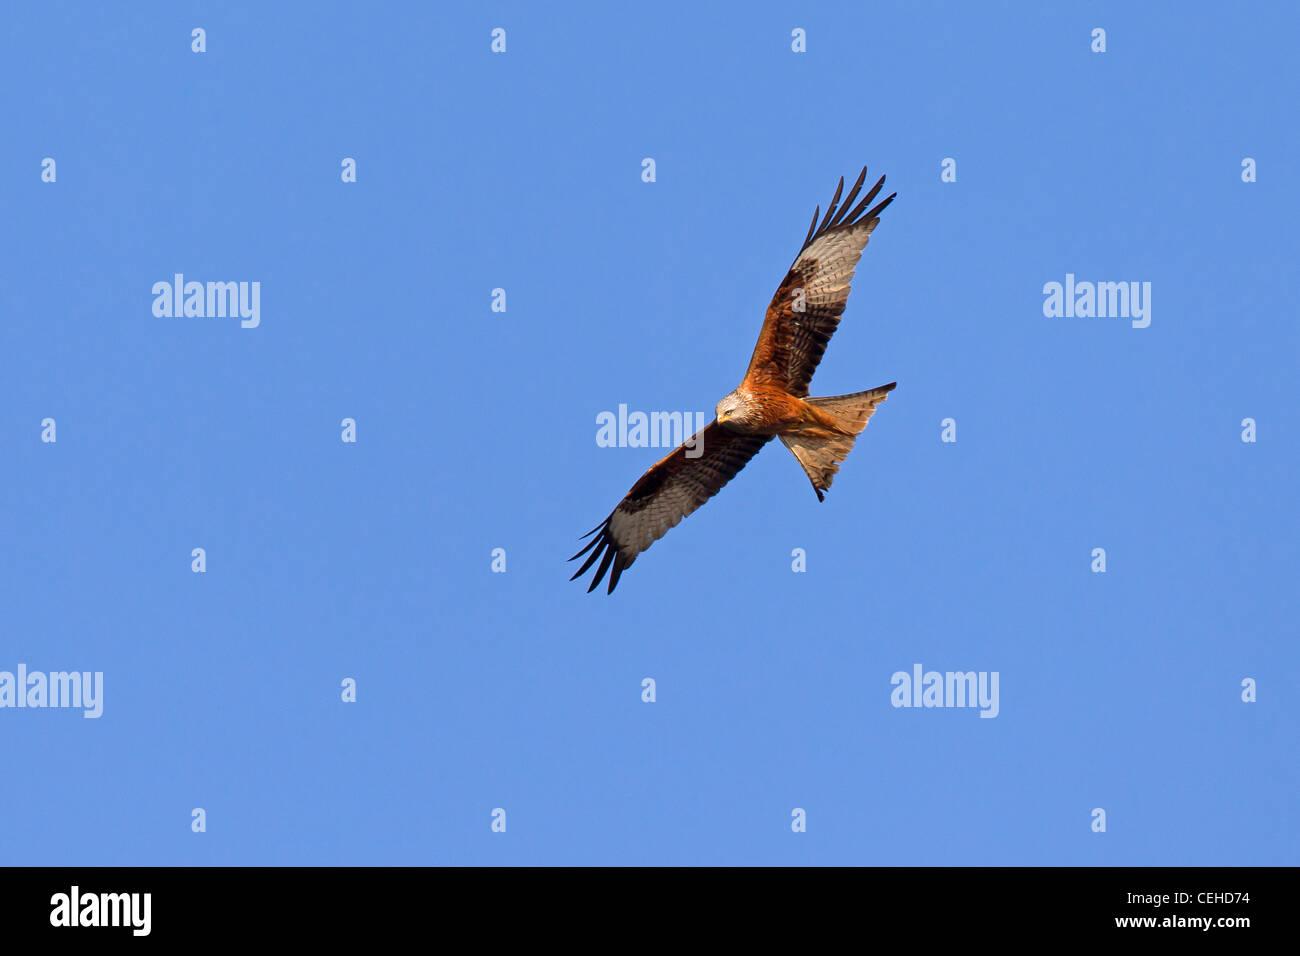 Red Kite (Milvus milvus) in flight - Stock Image